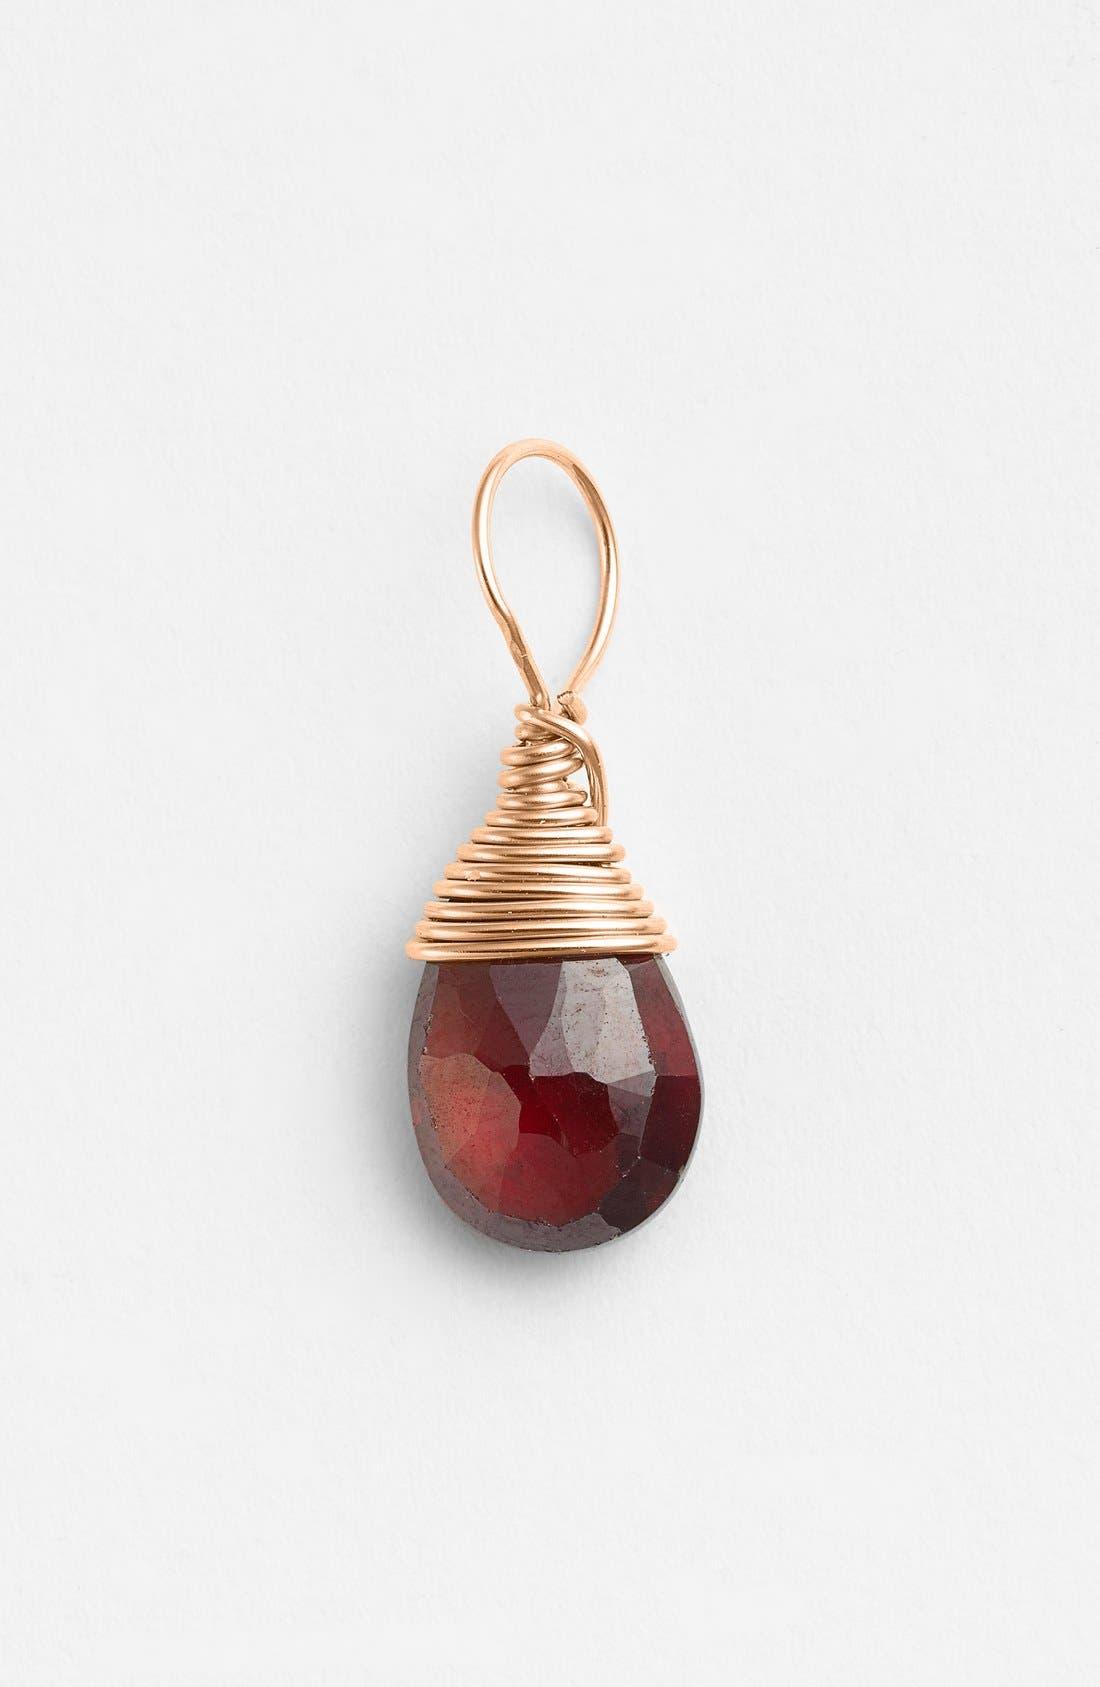 14k-Rose Gold Fill & Semiprecious Stone Charm,                             Main thumbnail 1, color,                             GARNET